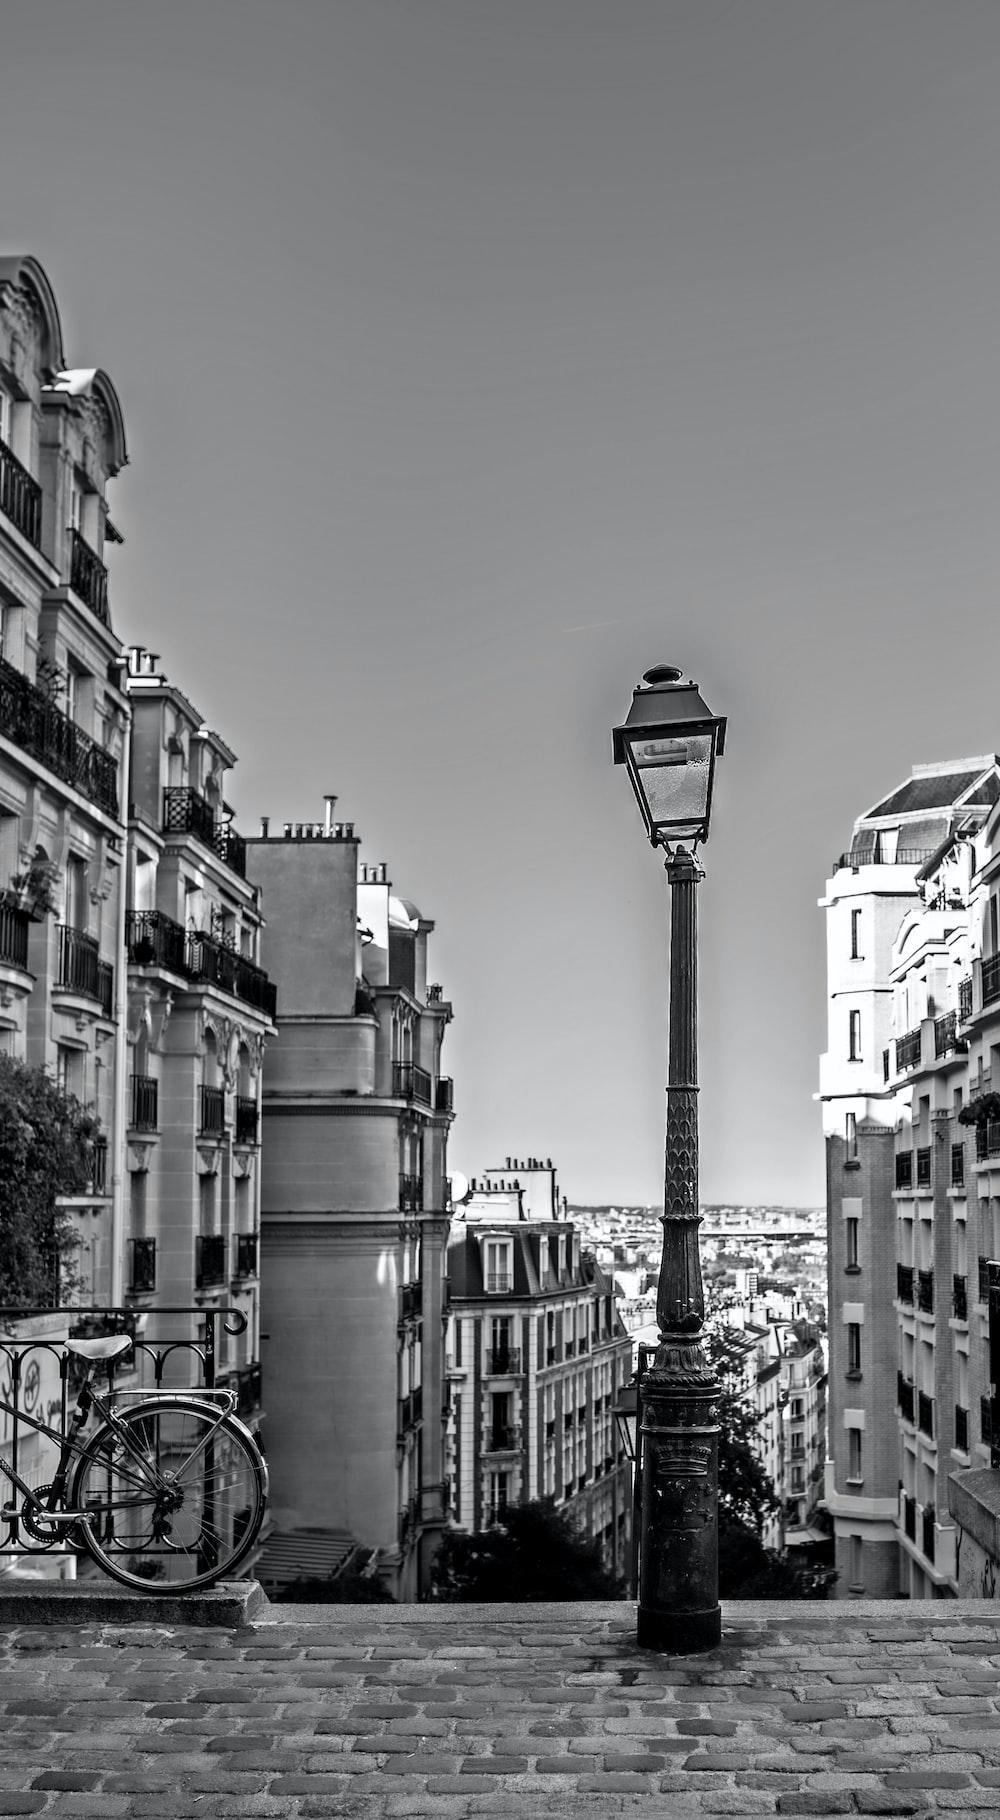 grayscale photo of street light near building